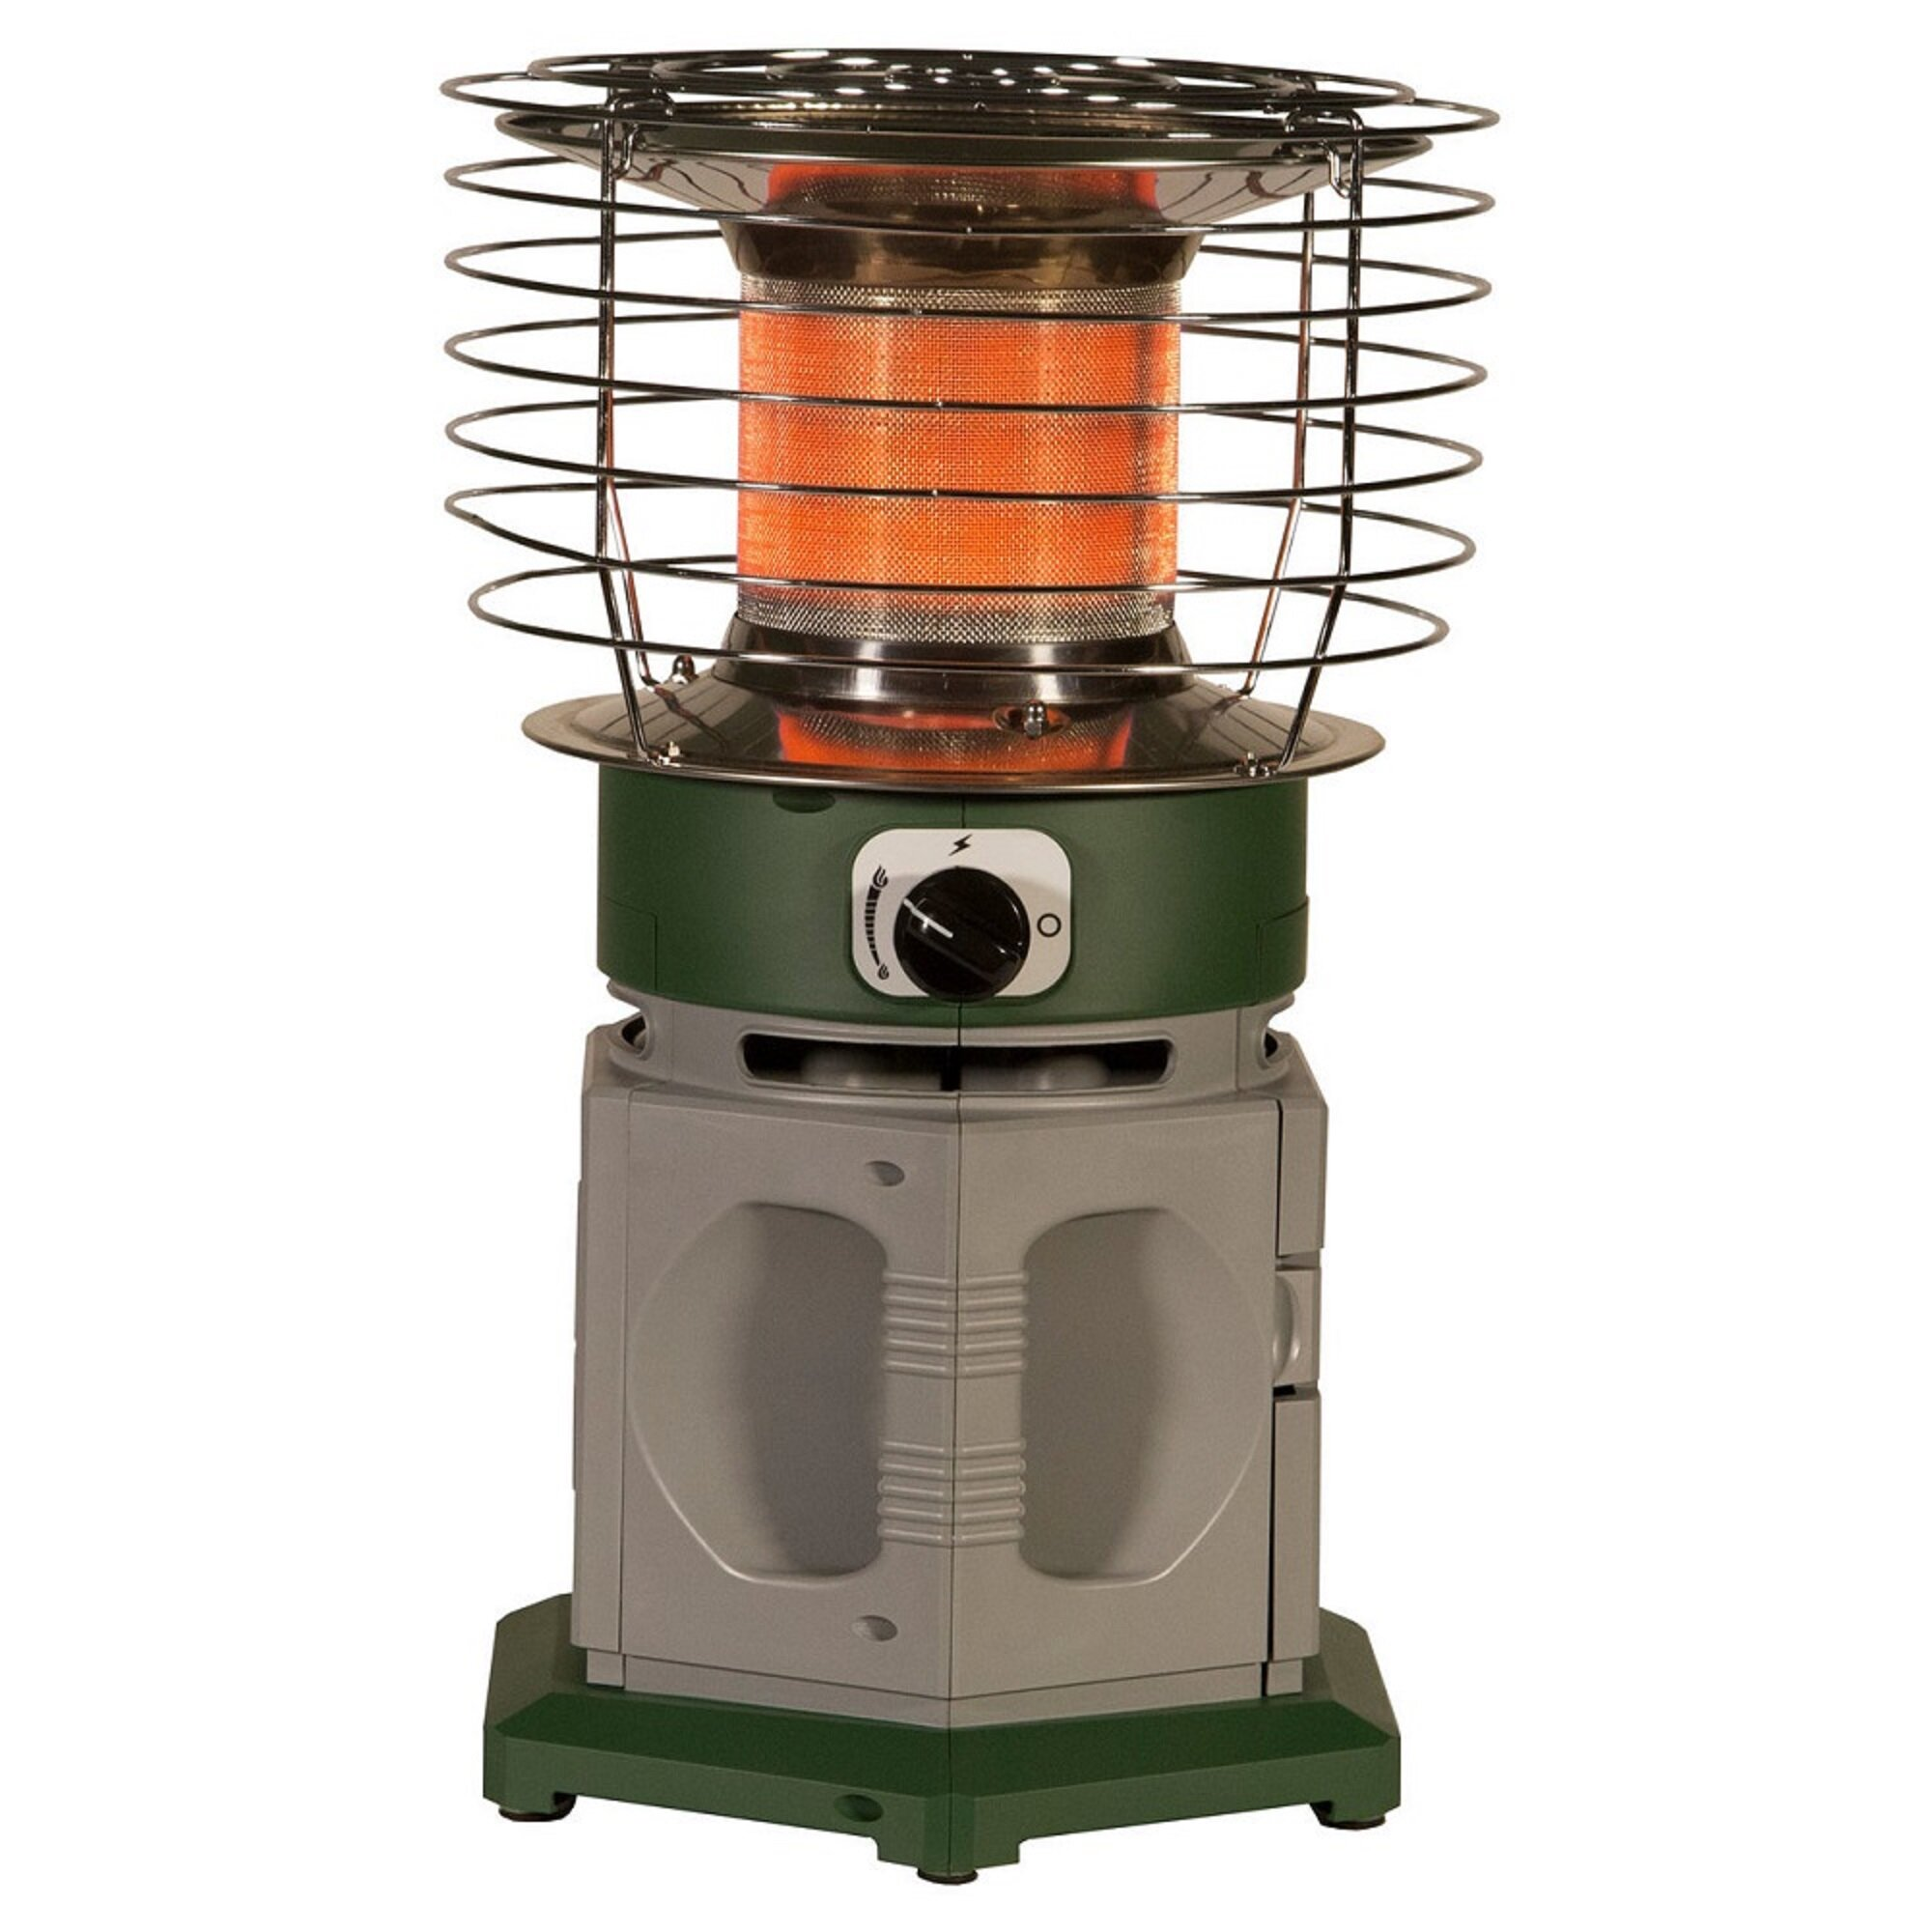 Propane Radiant Heater >> Dura Heat Double Tank Portable 18 000 Btu Propane Radiant Radiator Heater